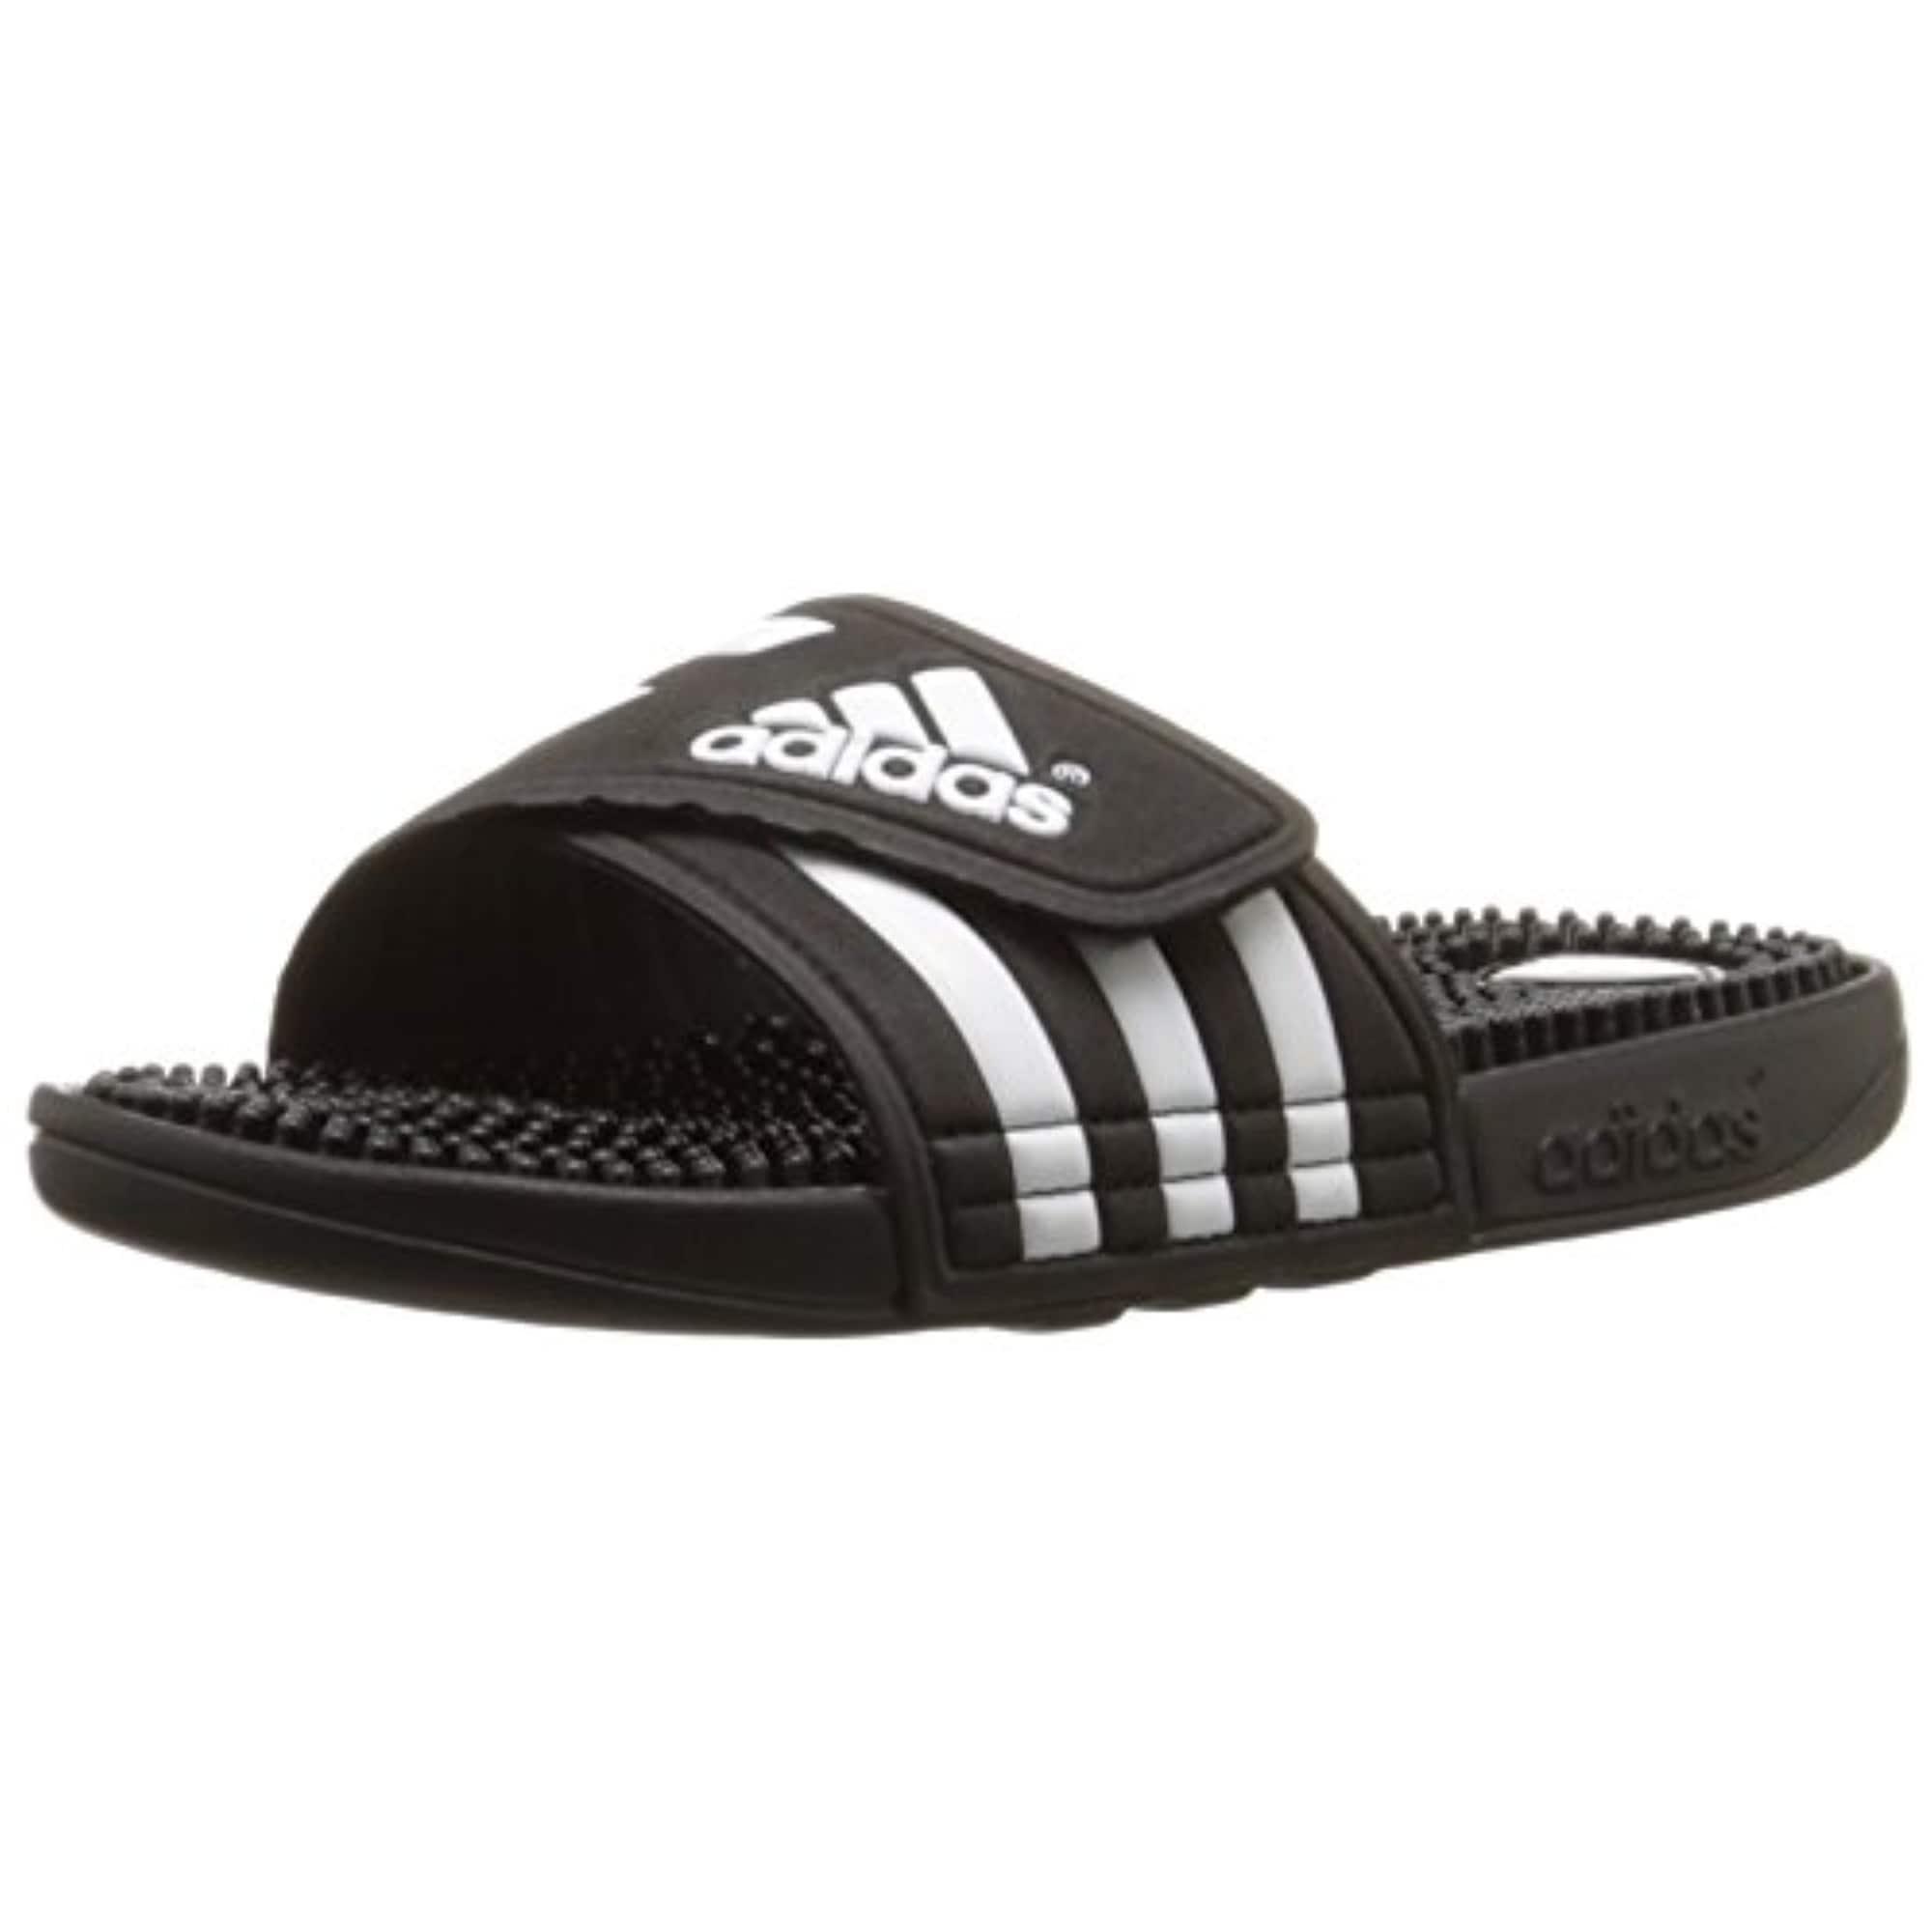 18bc01e0bd62 Shop Adidas Women s Adissage Slide